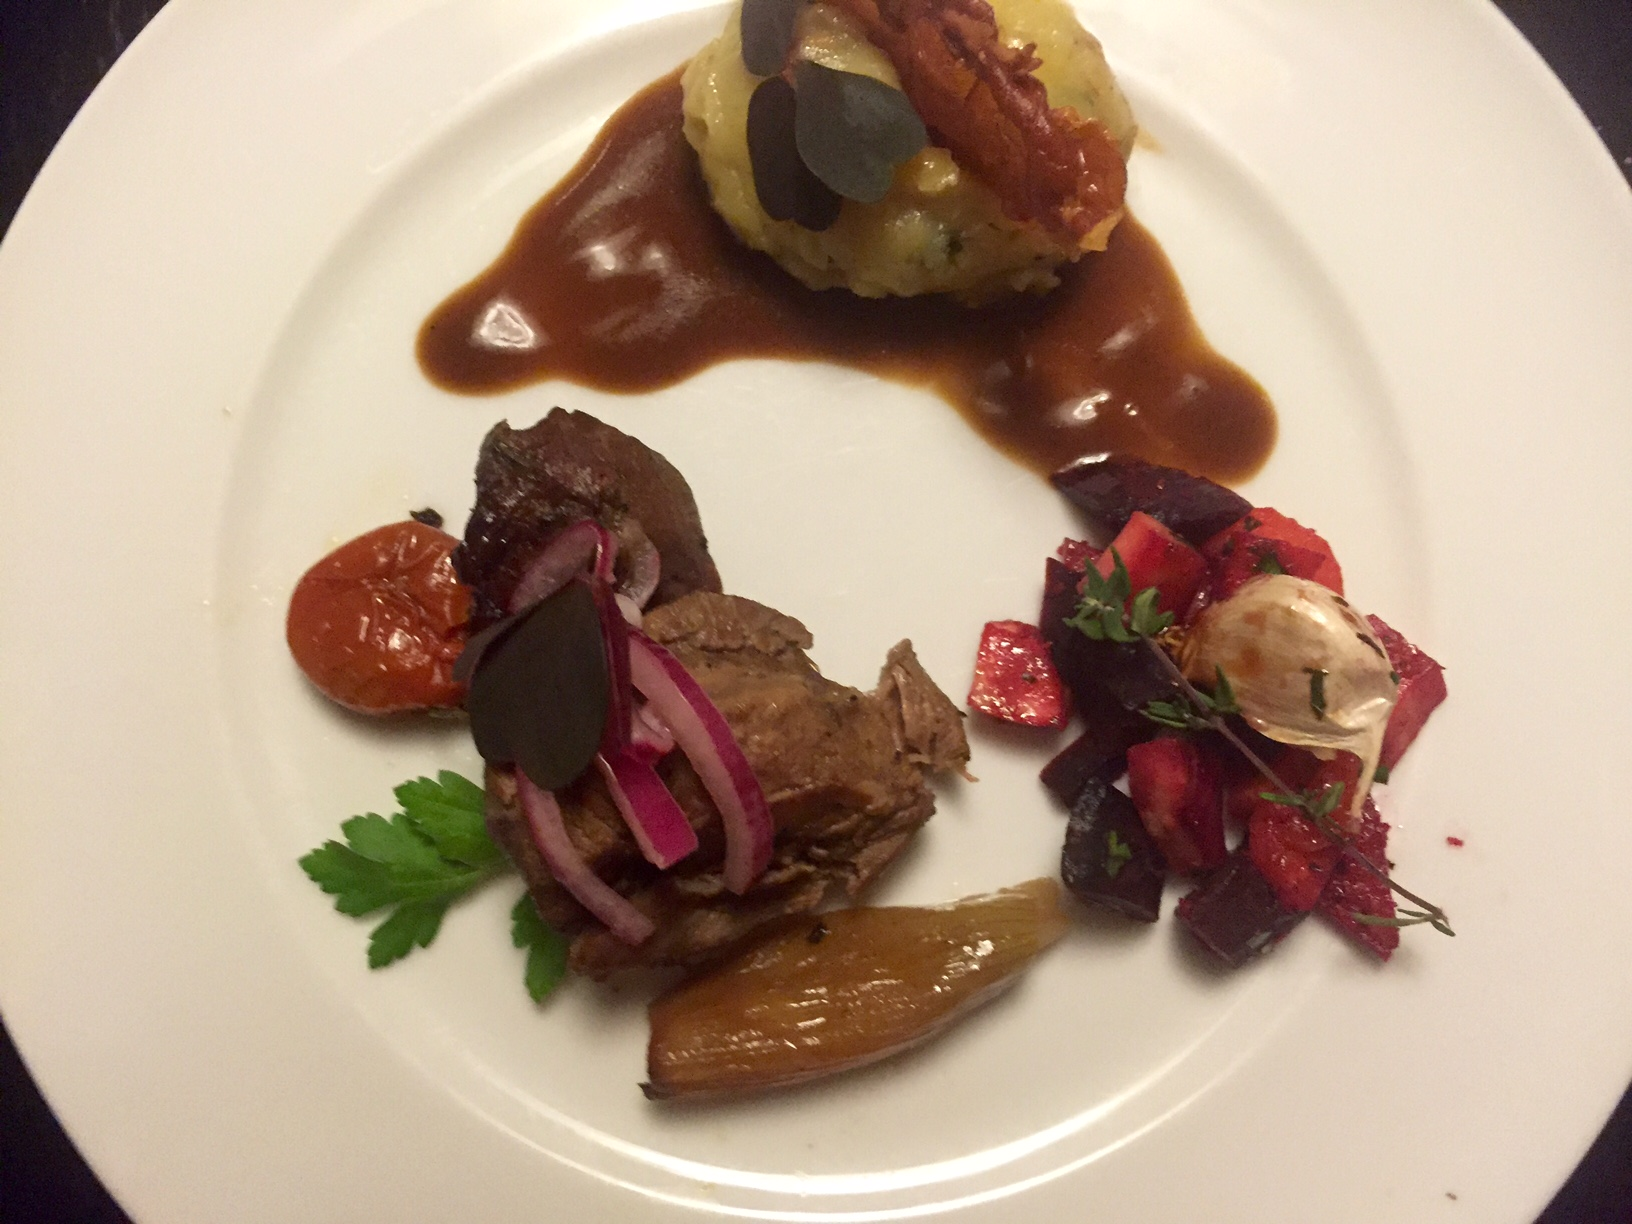 Ølbraiserede svinekæber i stegeso - Verdens møreste kød